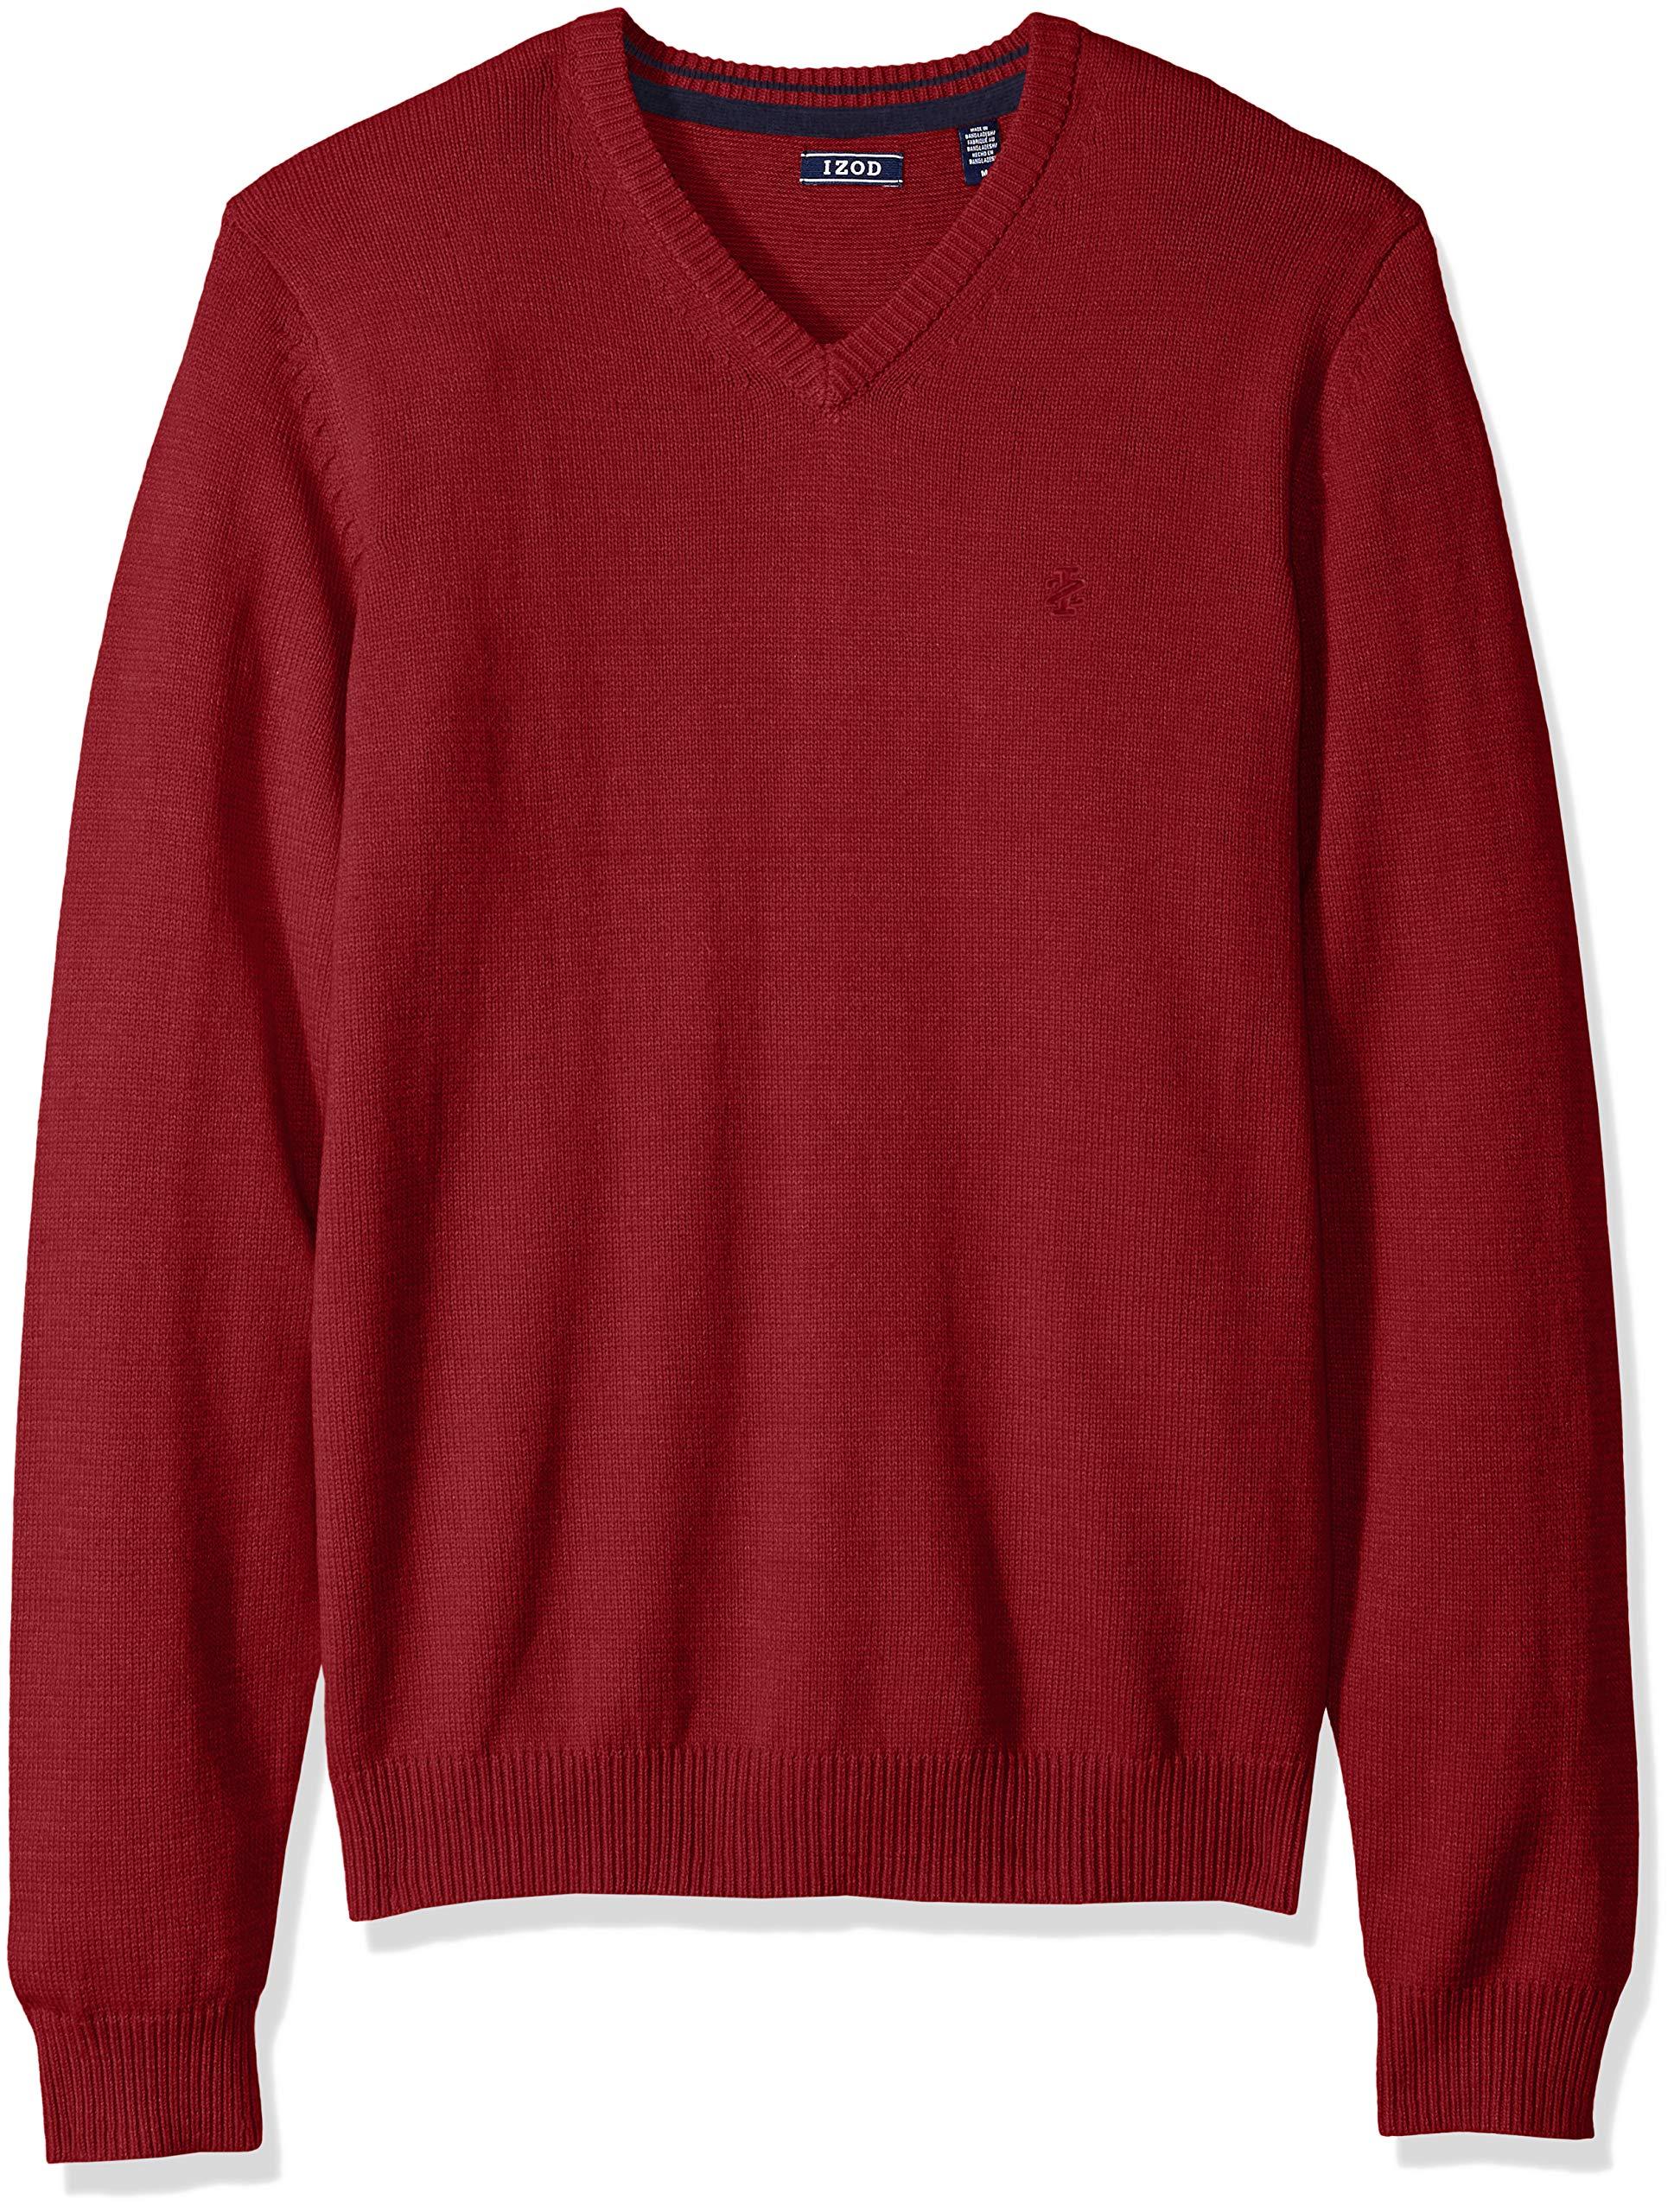 IZOD Men's Fine Gauge Solid V-Neck Sweater, New Biking red, Small